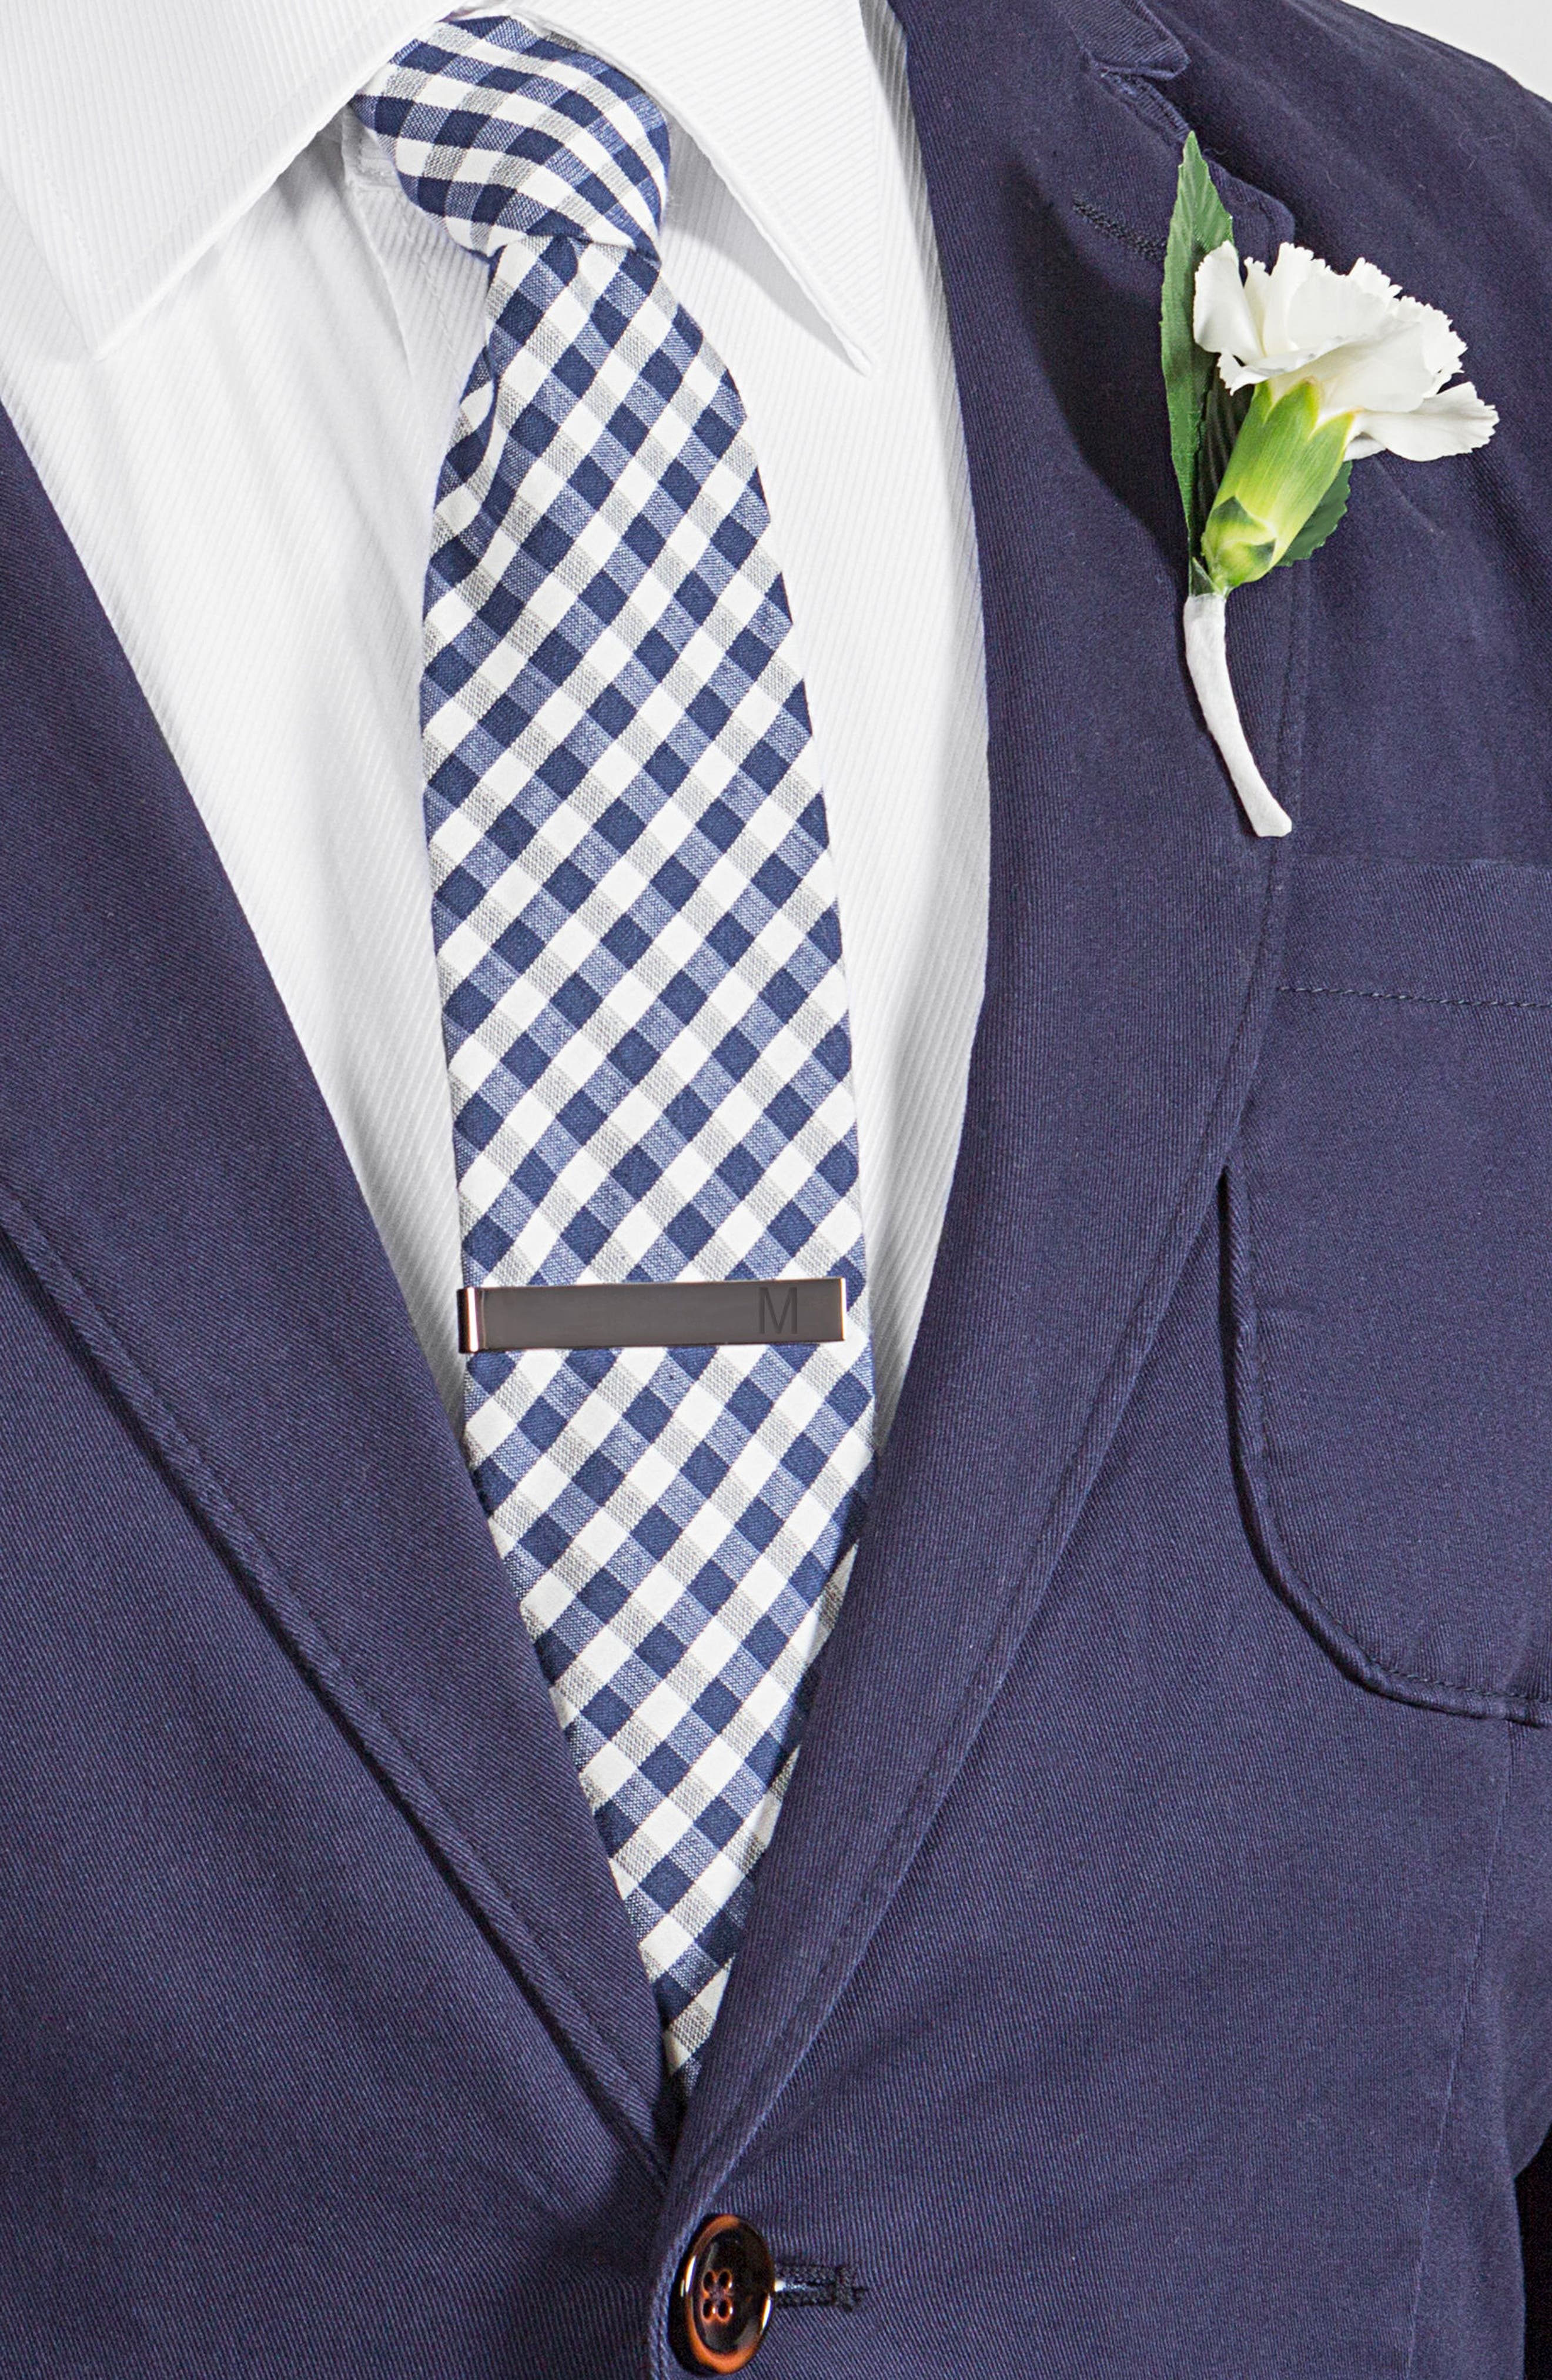 Monogram Cuff Links & Tie Bar Set,                             Alternate thumbnail 3, color,                             020